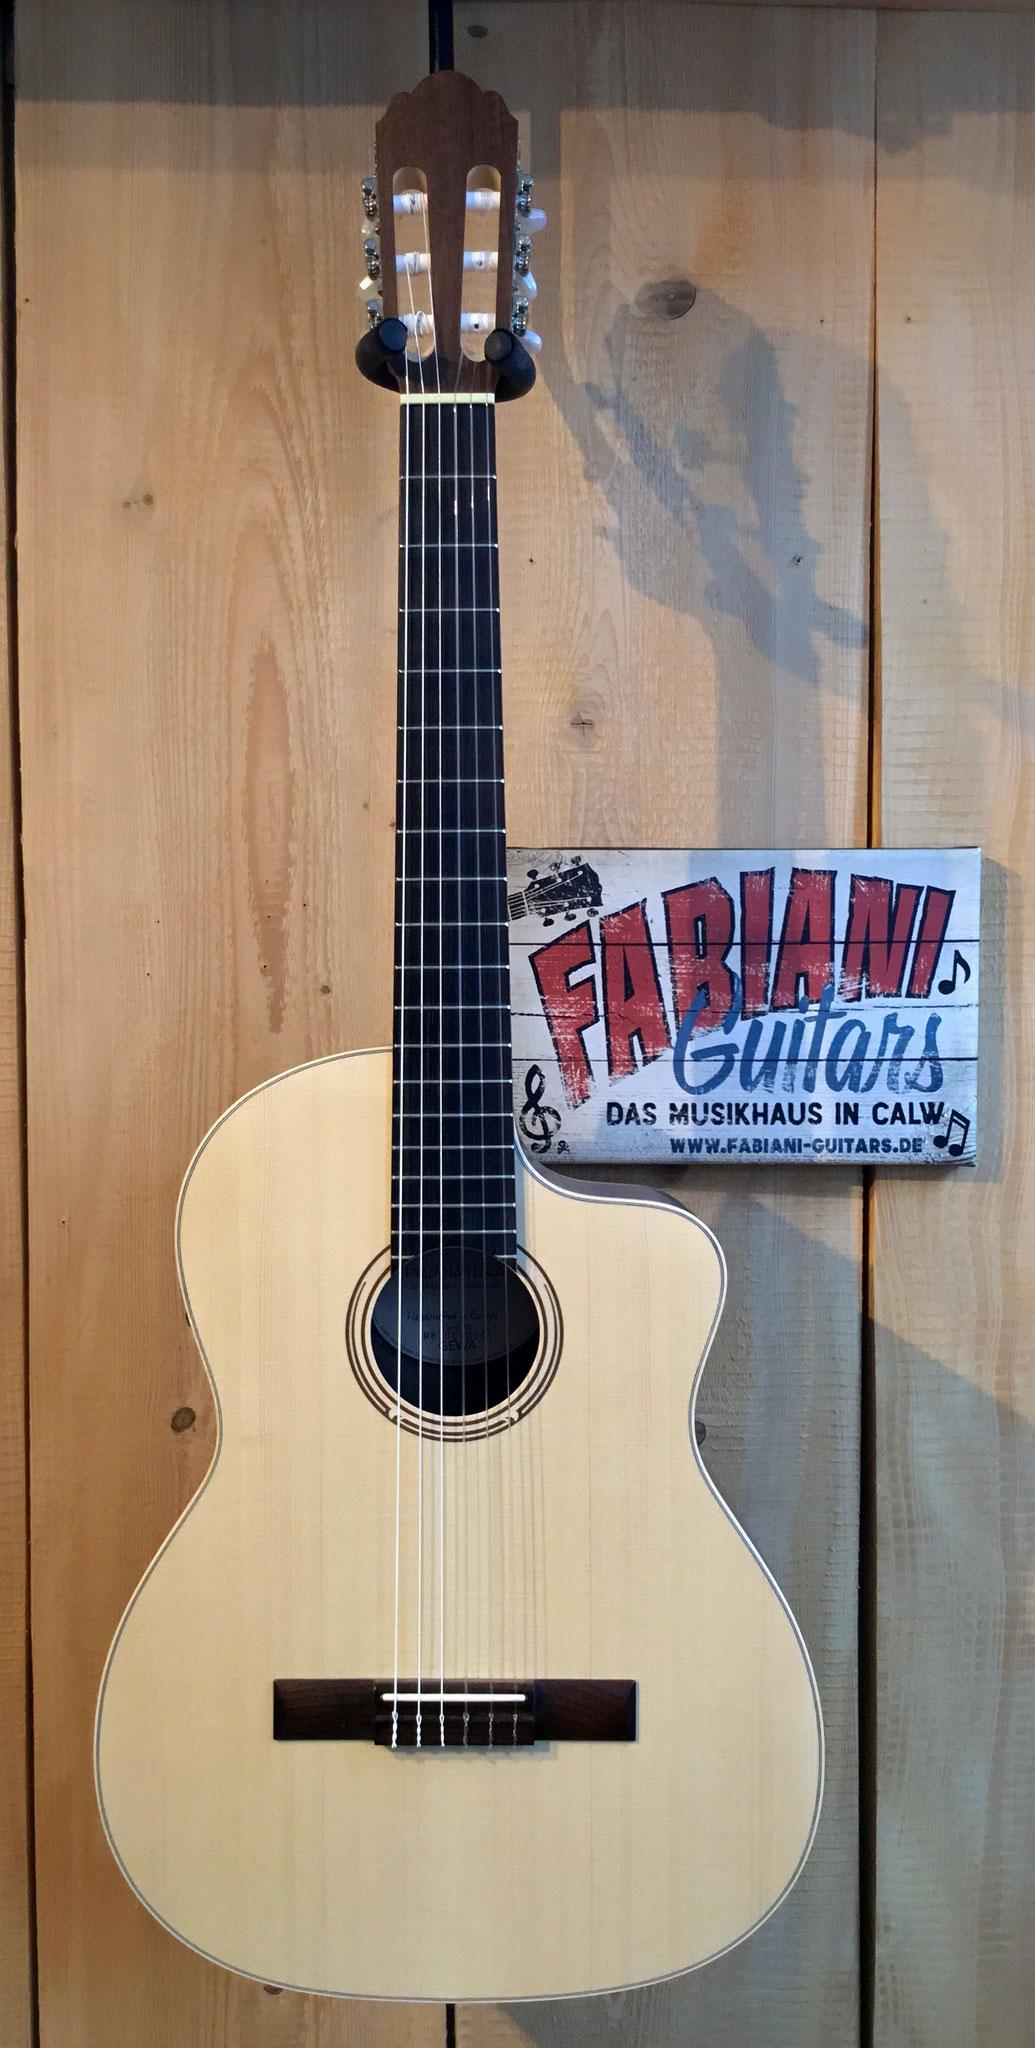 Pro Natura Silver Series Samba Walnuss/Walnut, elektrische Konzertgitarre, Tonabnehmer, Tuner, Musik Fabiani Guitars 75365 Calw